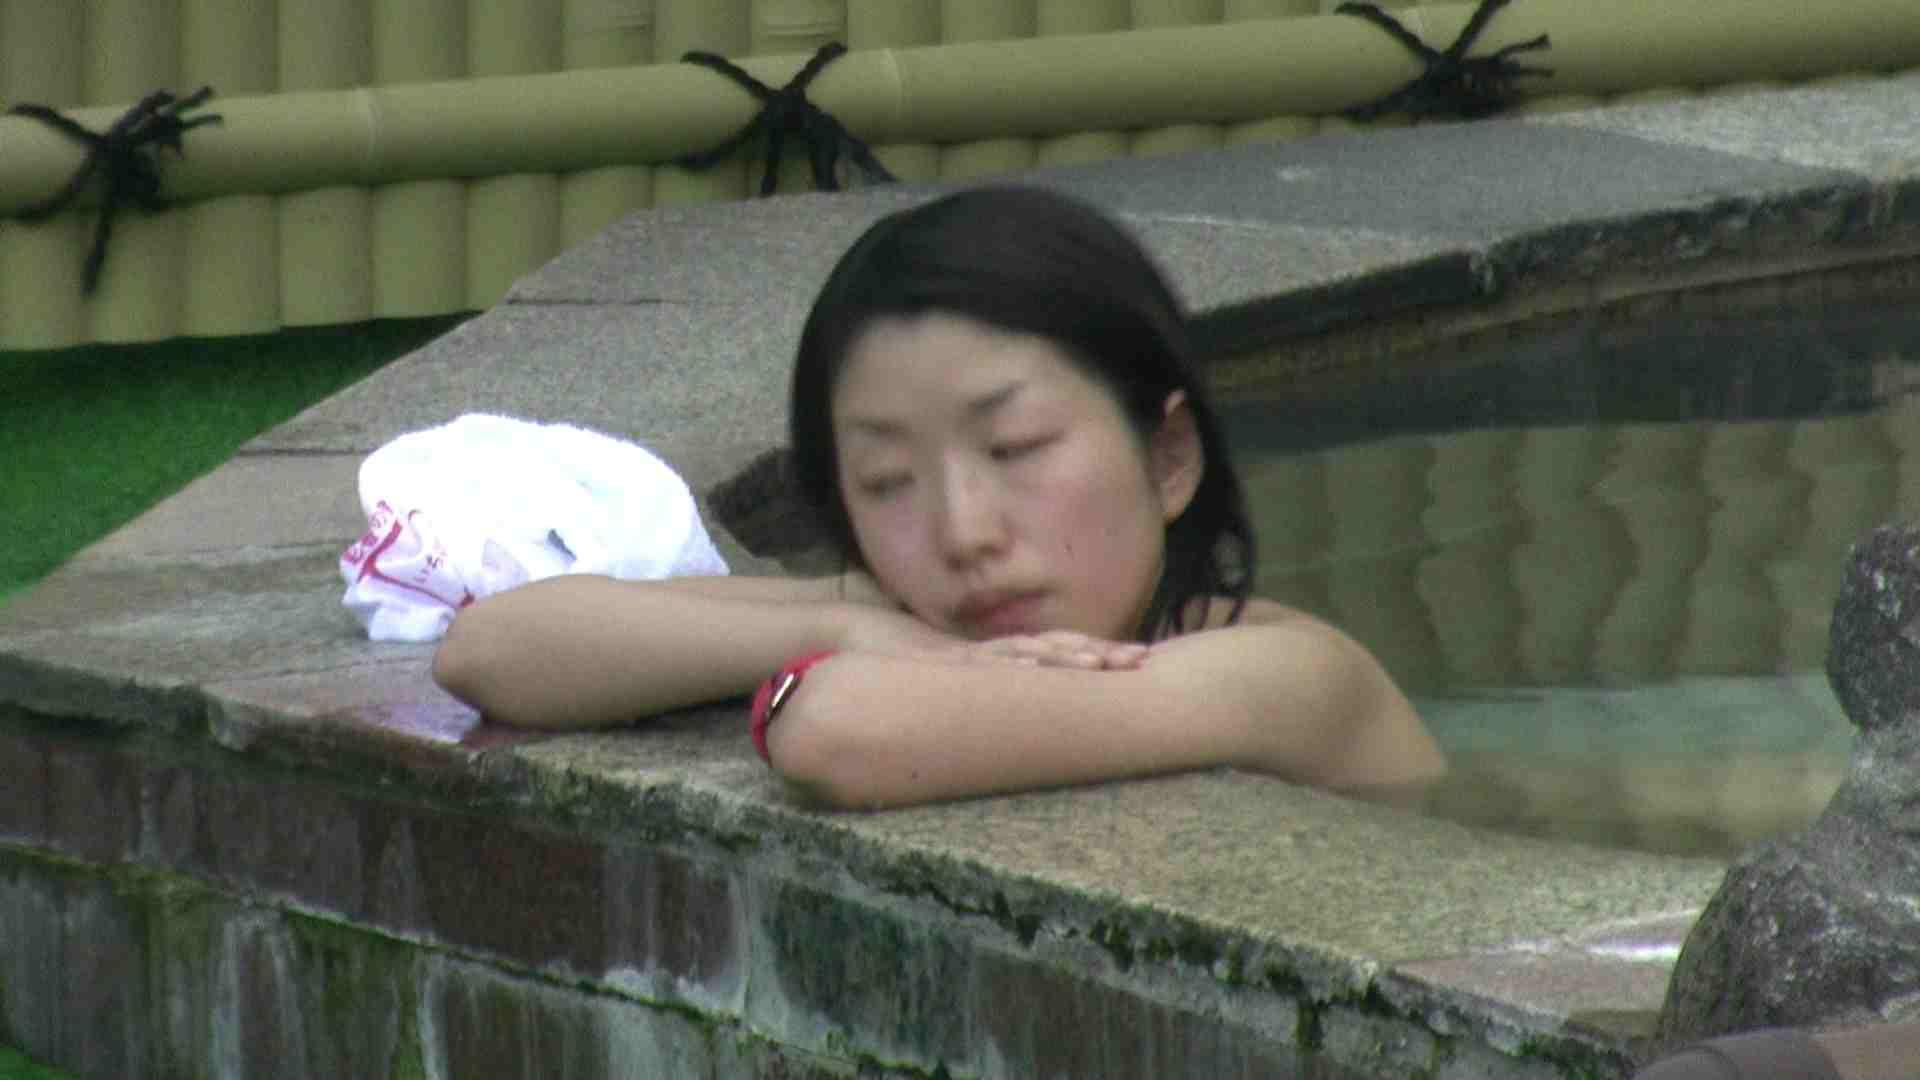 Aquaな露天風呂Vol.133 0 | 0  19連発 11